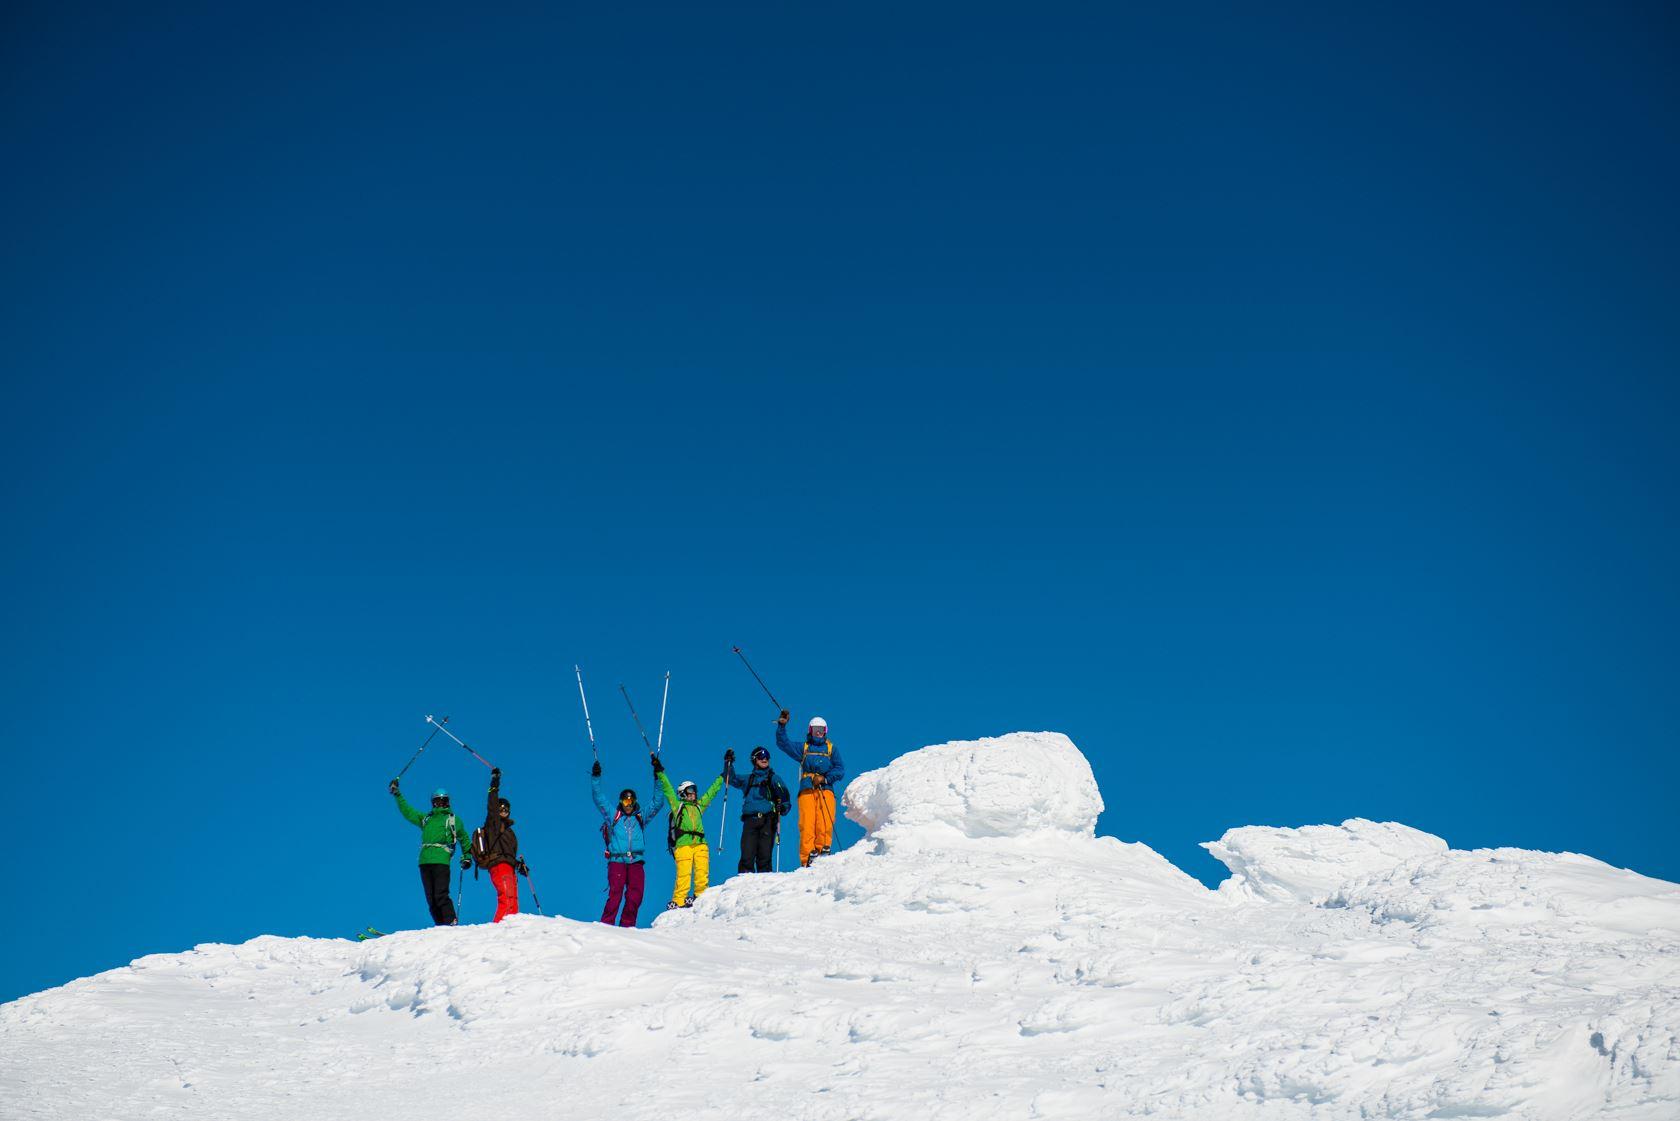 MyrkLeik Fjellfestival Vinter